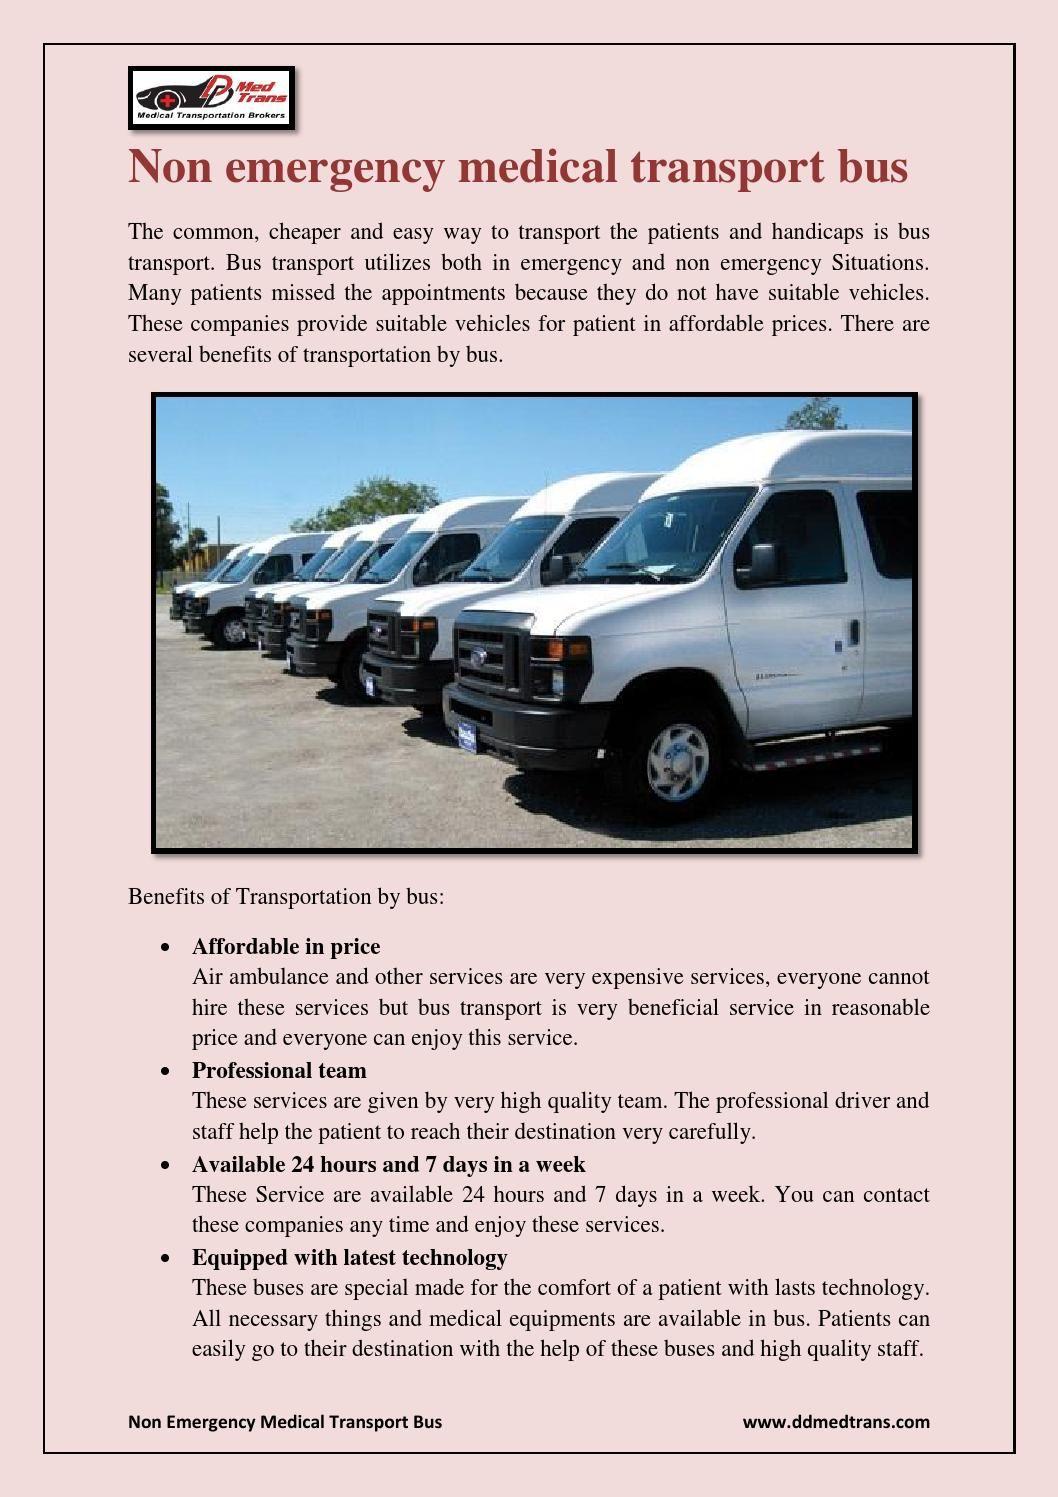 Non emergency medical transport bus Non emergency